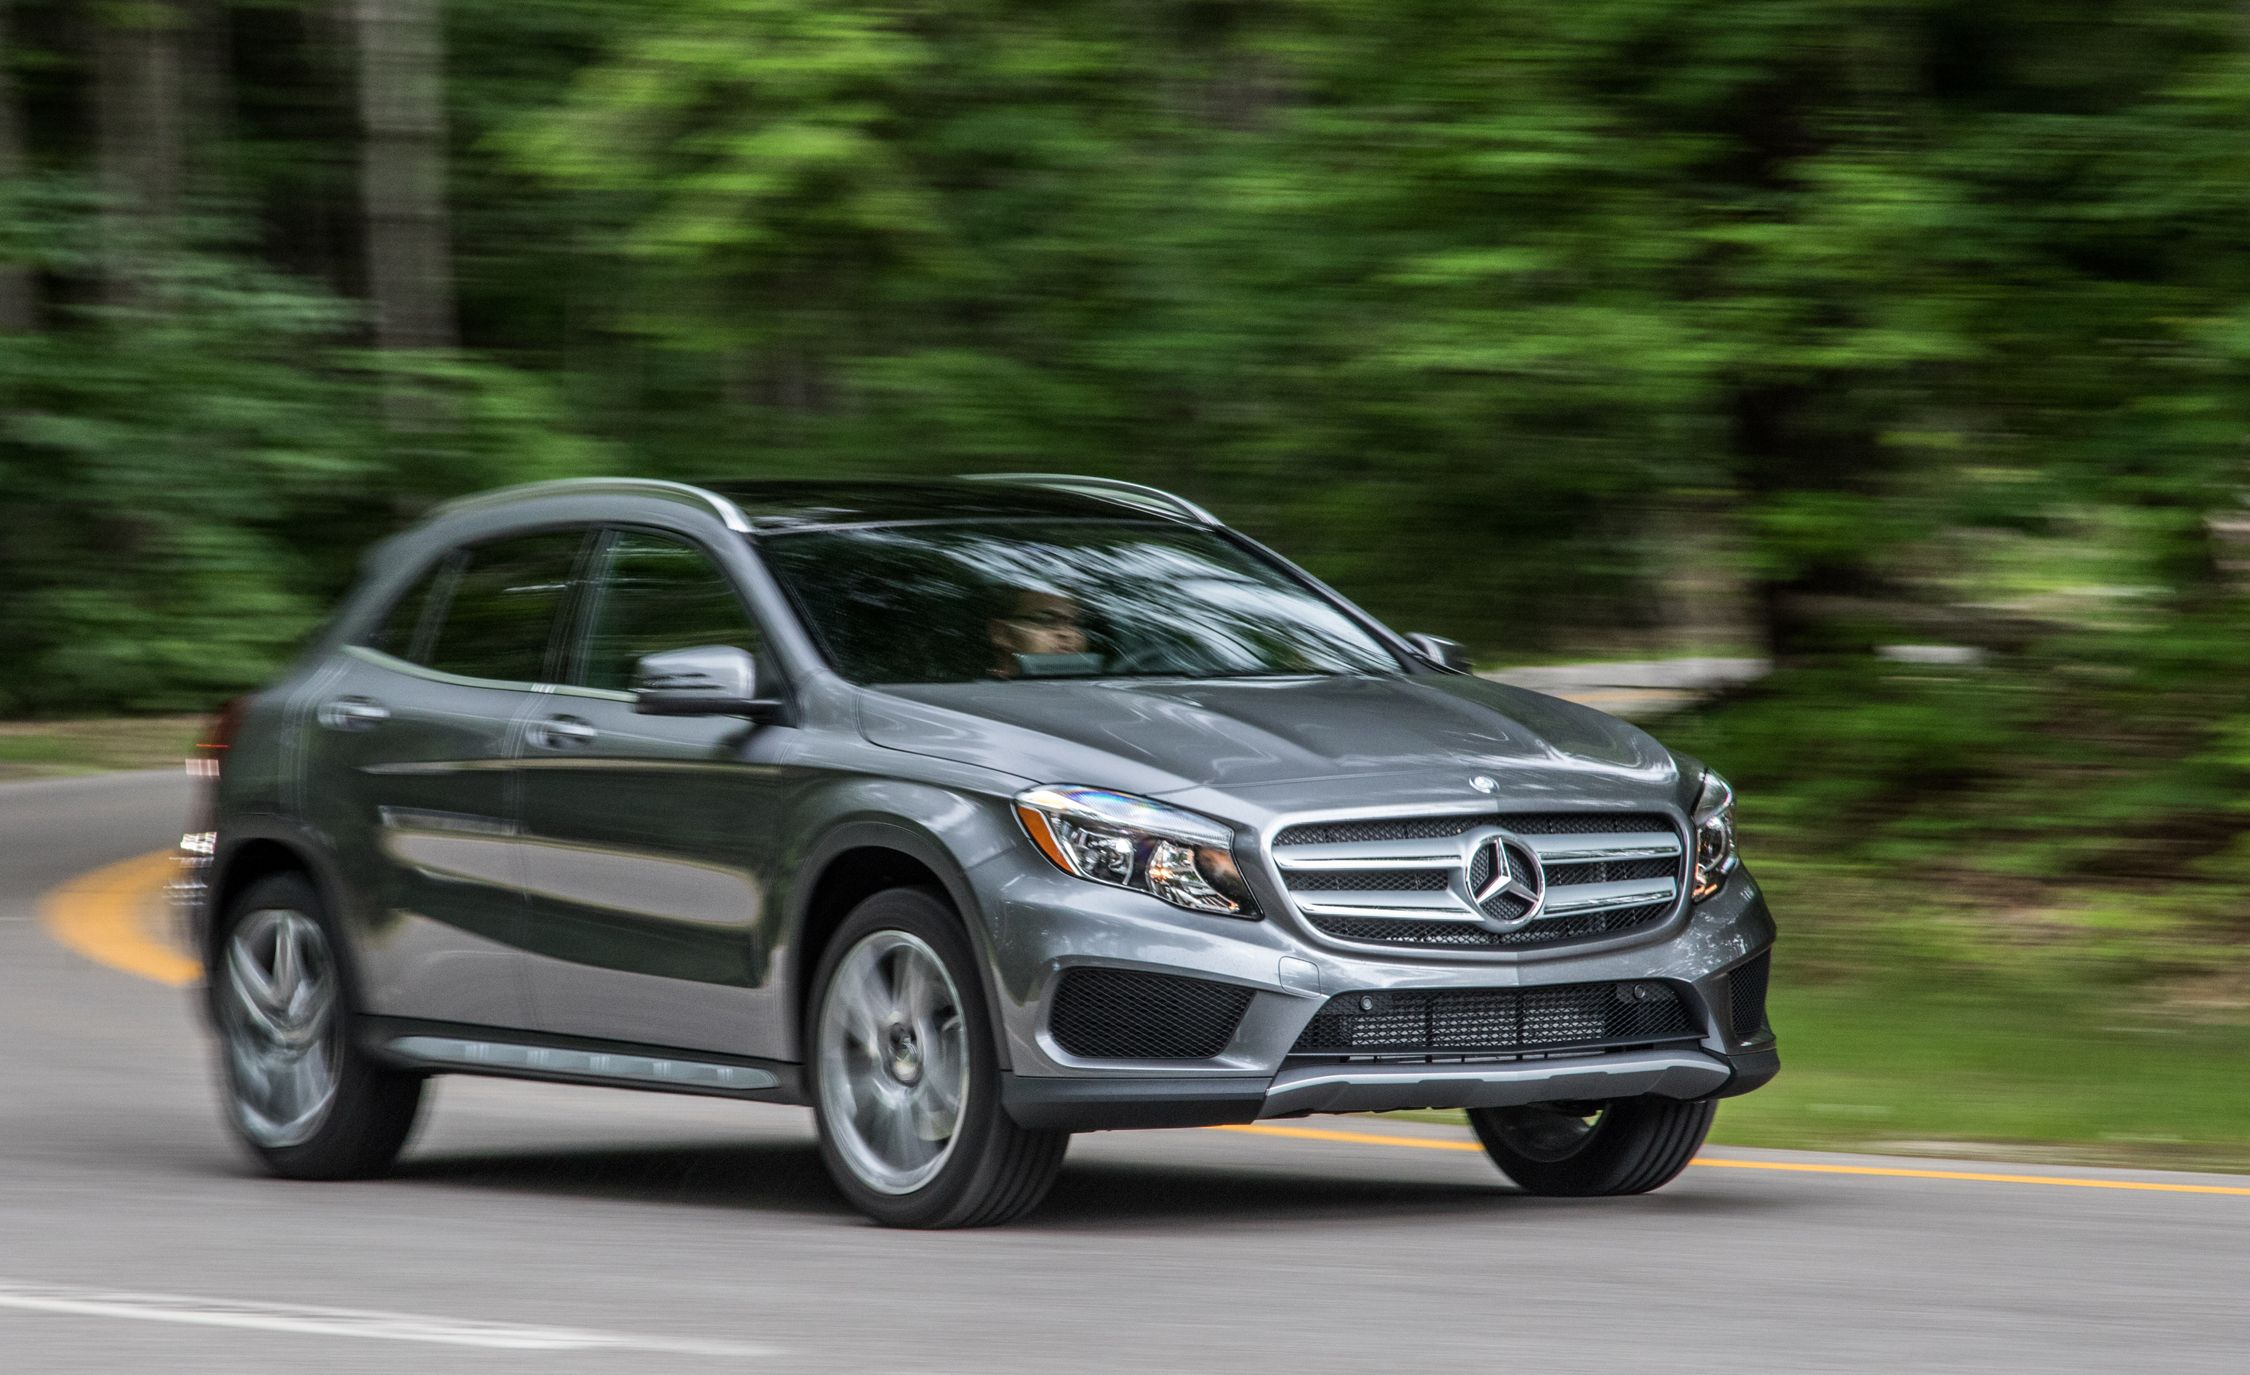 2015 Mercedes Benz GLA250 4MATIC Test Review